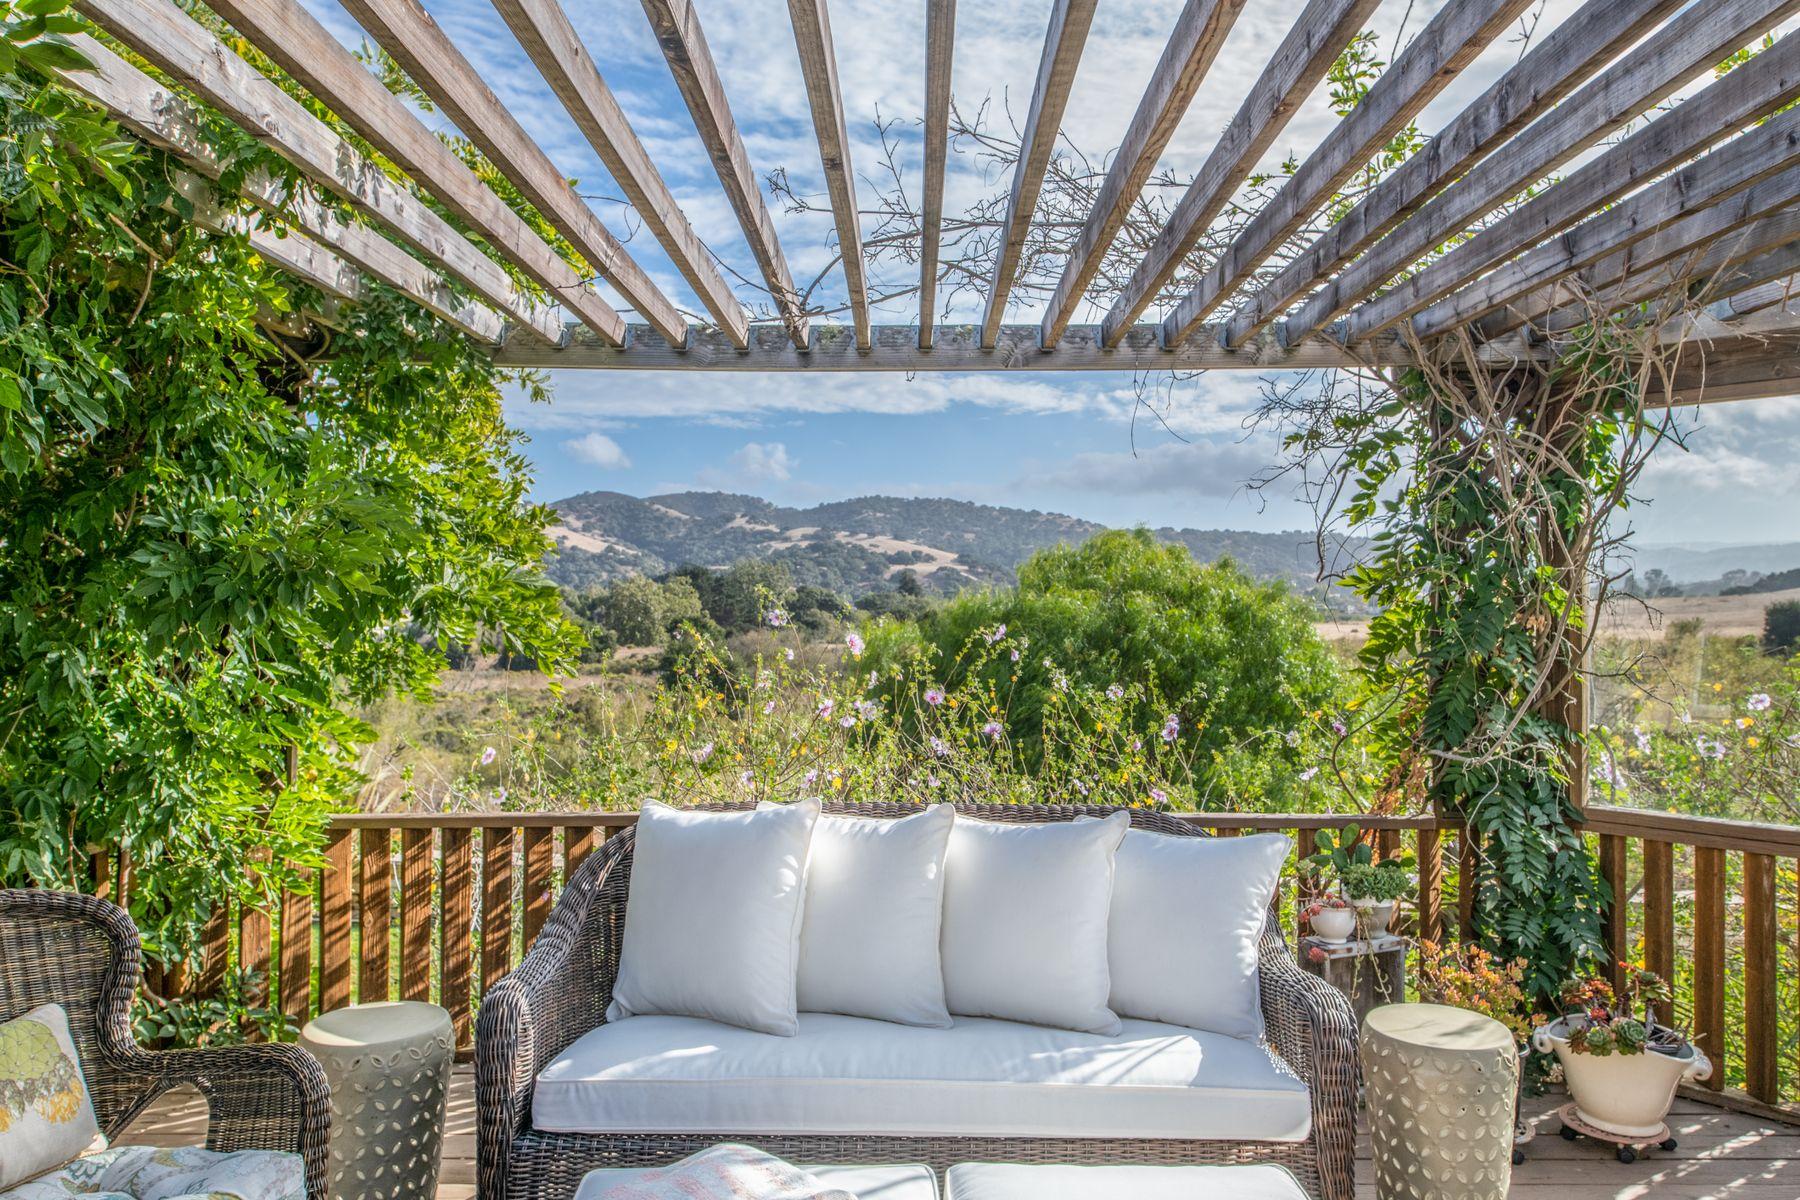 Single Family Homes for Sale at Toro Hills Estates Trifecta 16614 Toro Hills Court Salinas, California 93908 United States